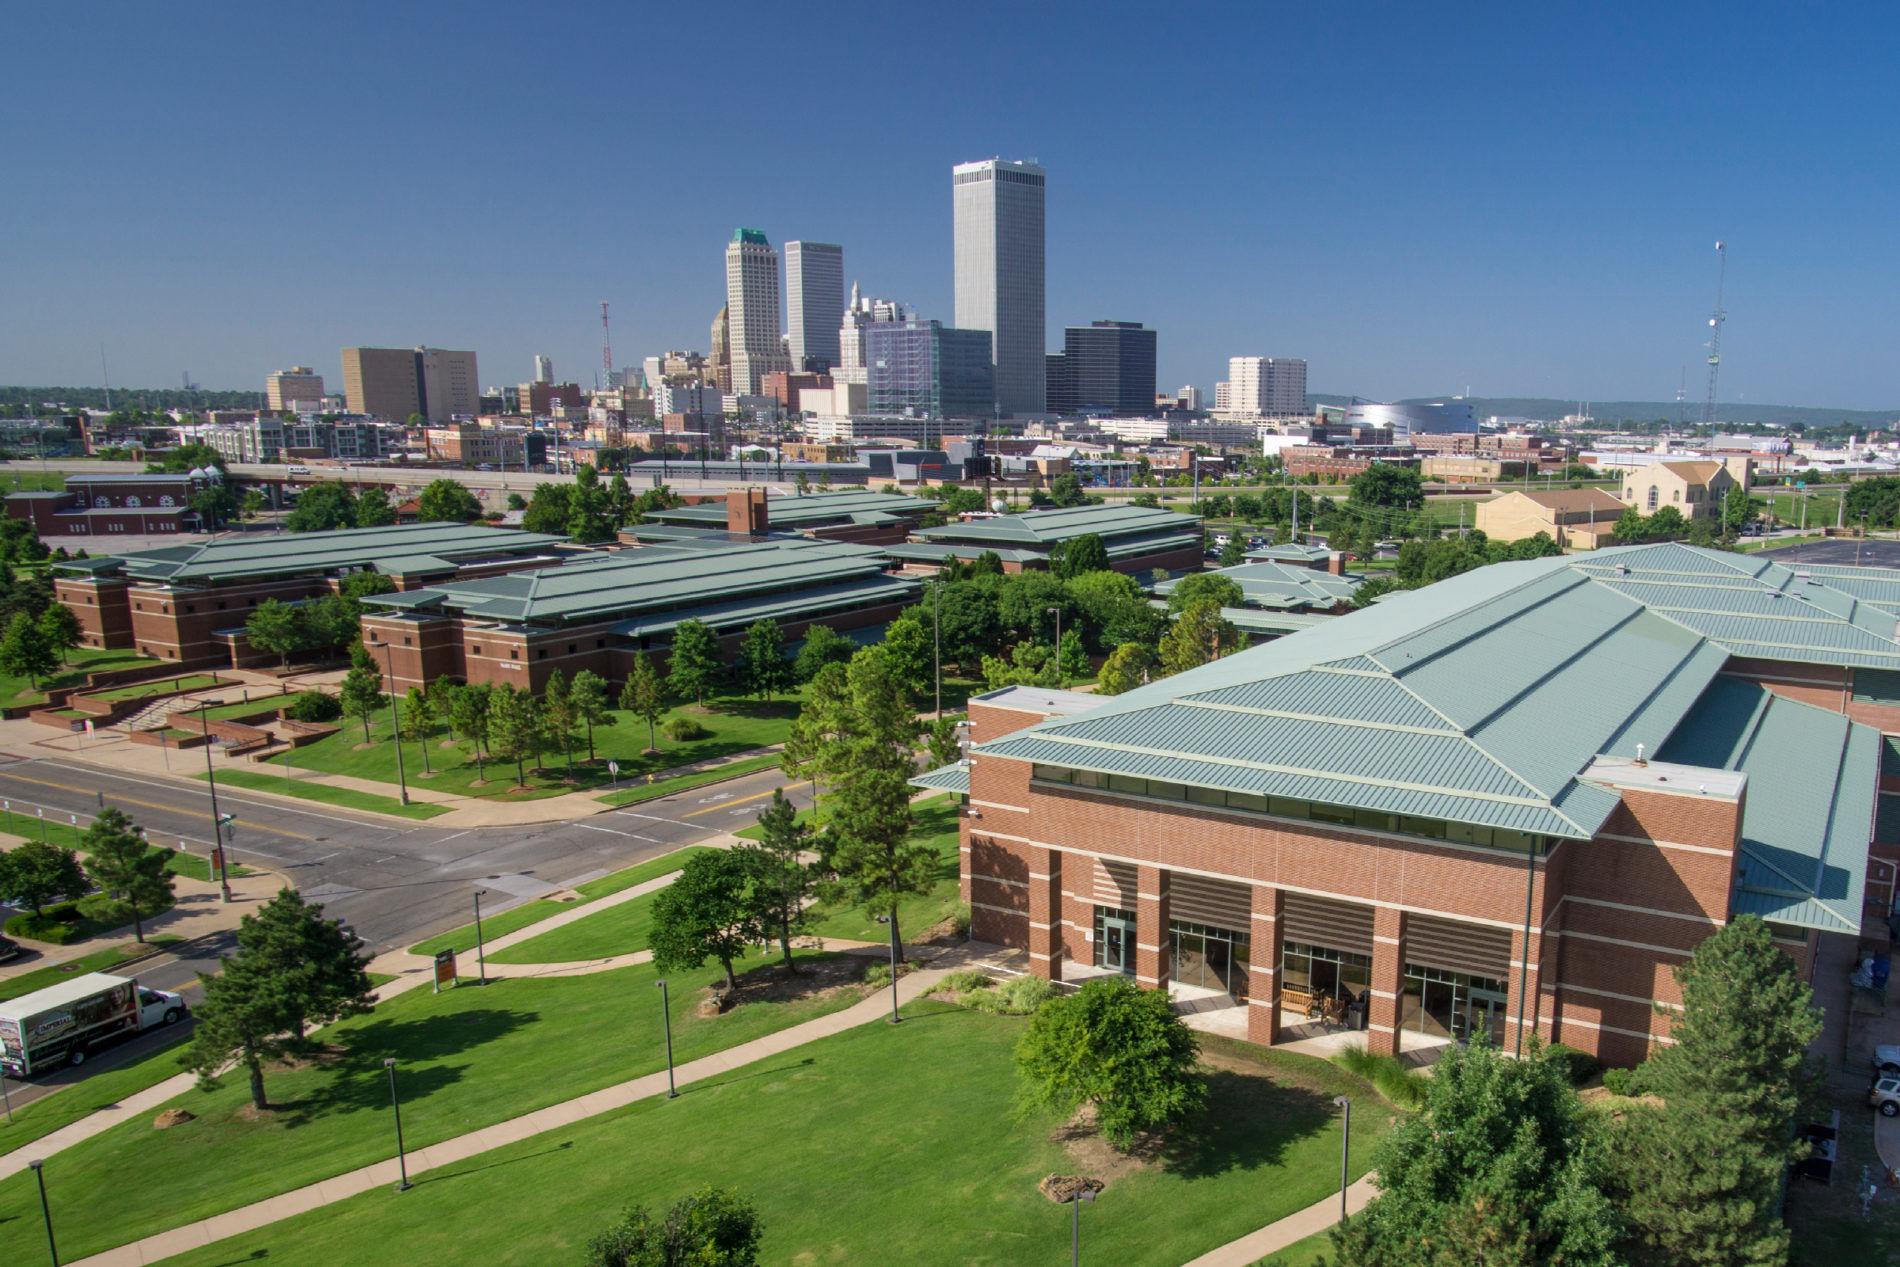 OSU-Tulsa with Tulsa Skyline in background